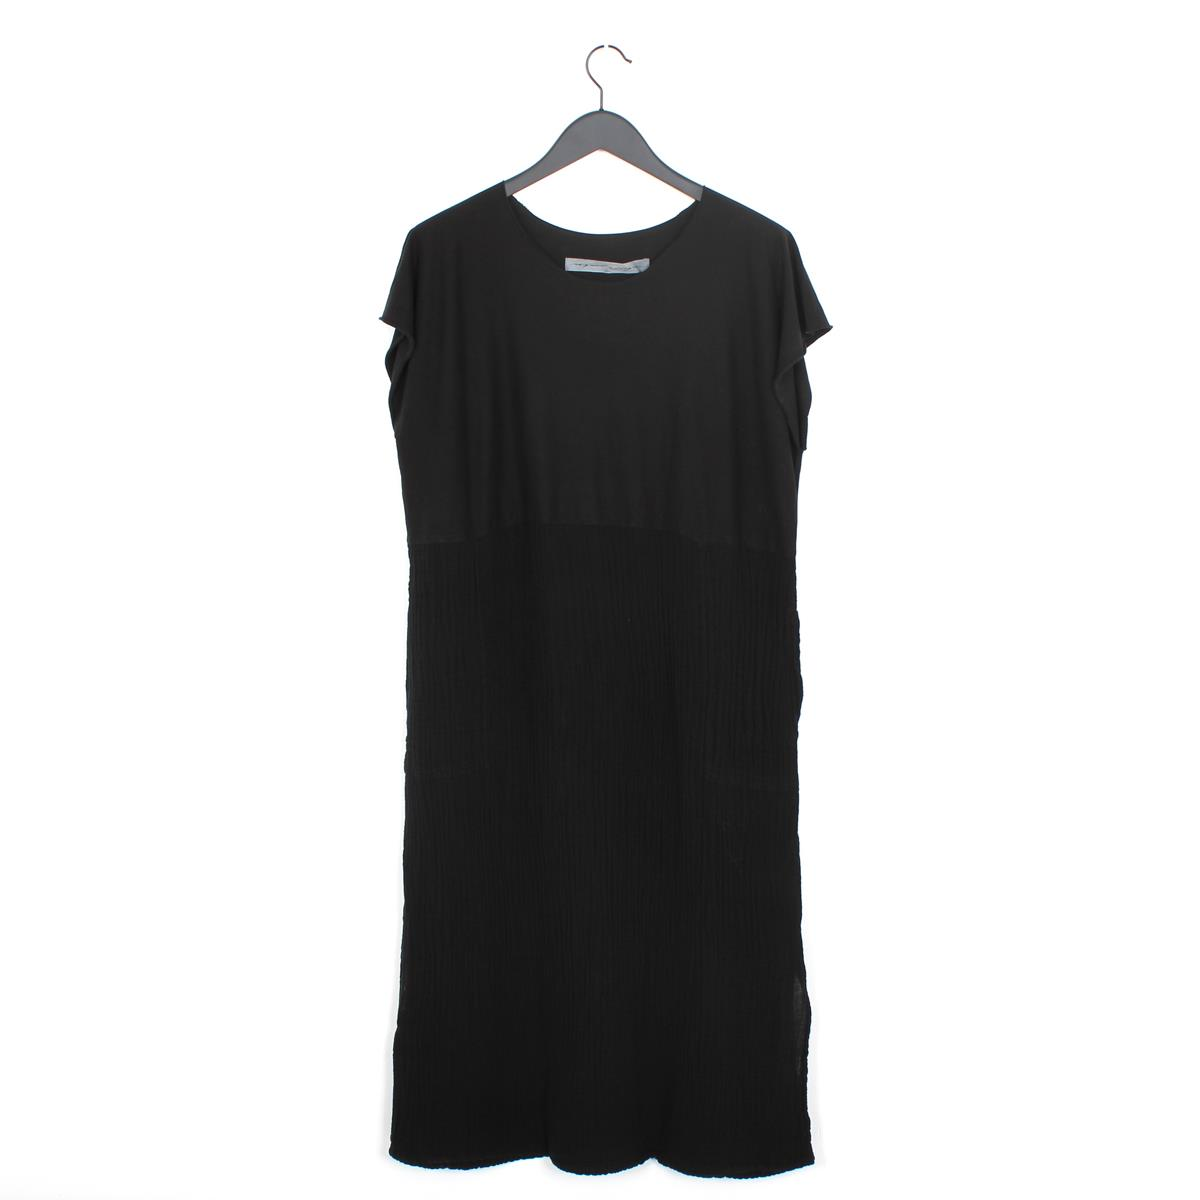 143781f371765 Raquel Allegra shift dress black. Zoom. Loading image.